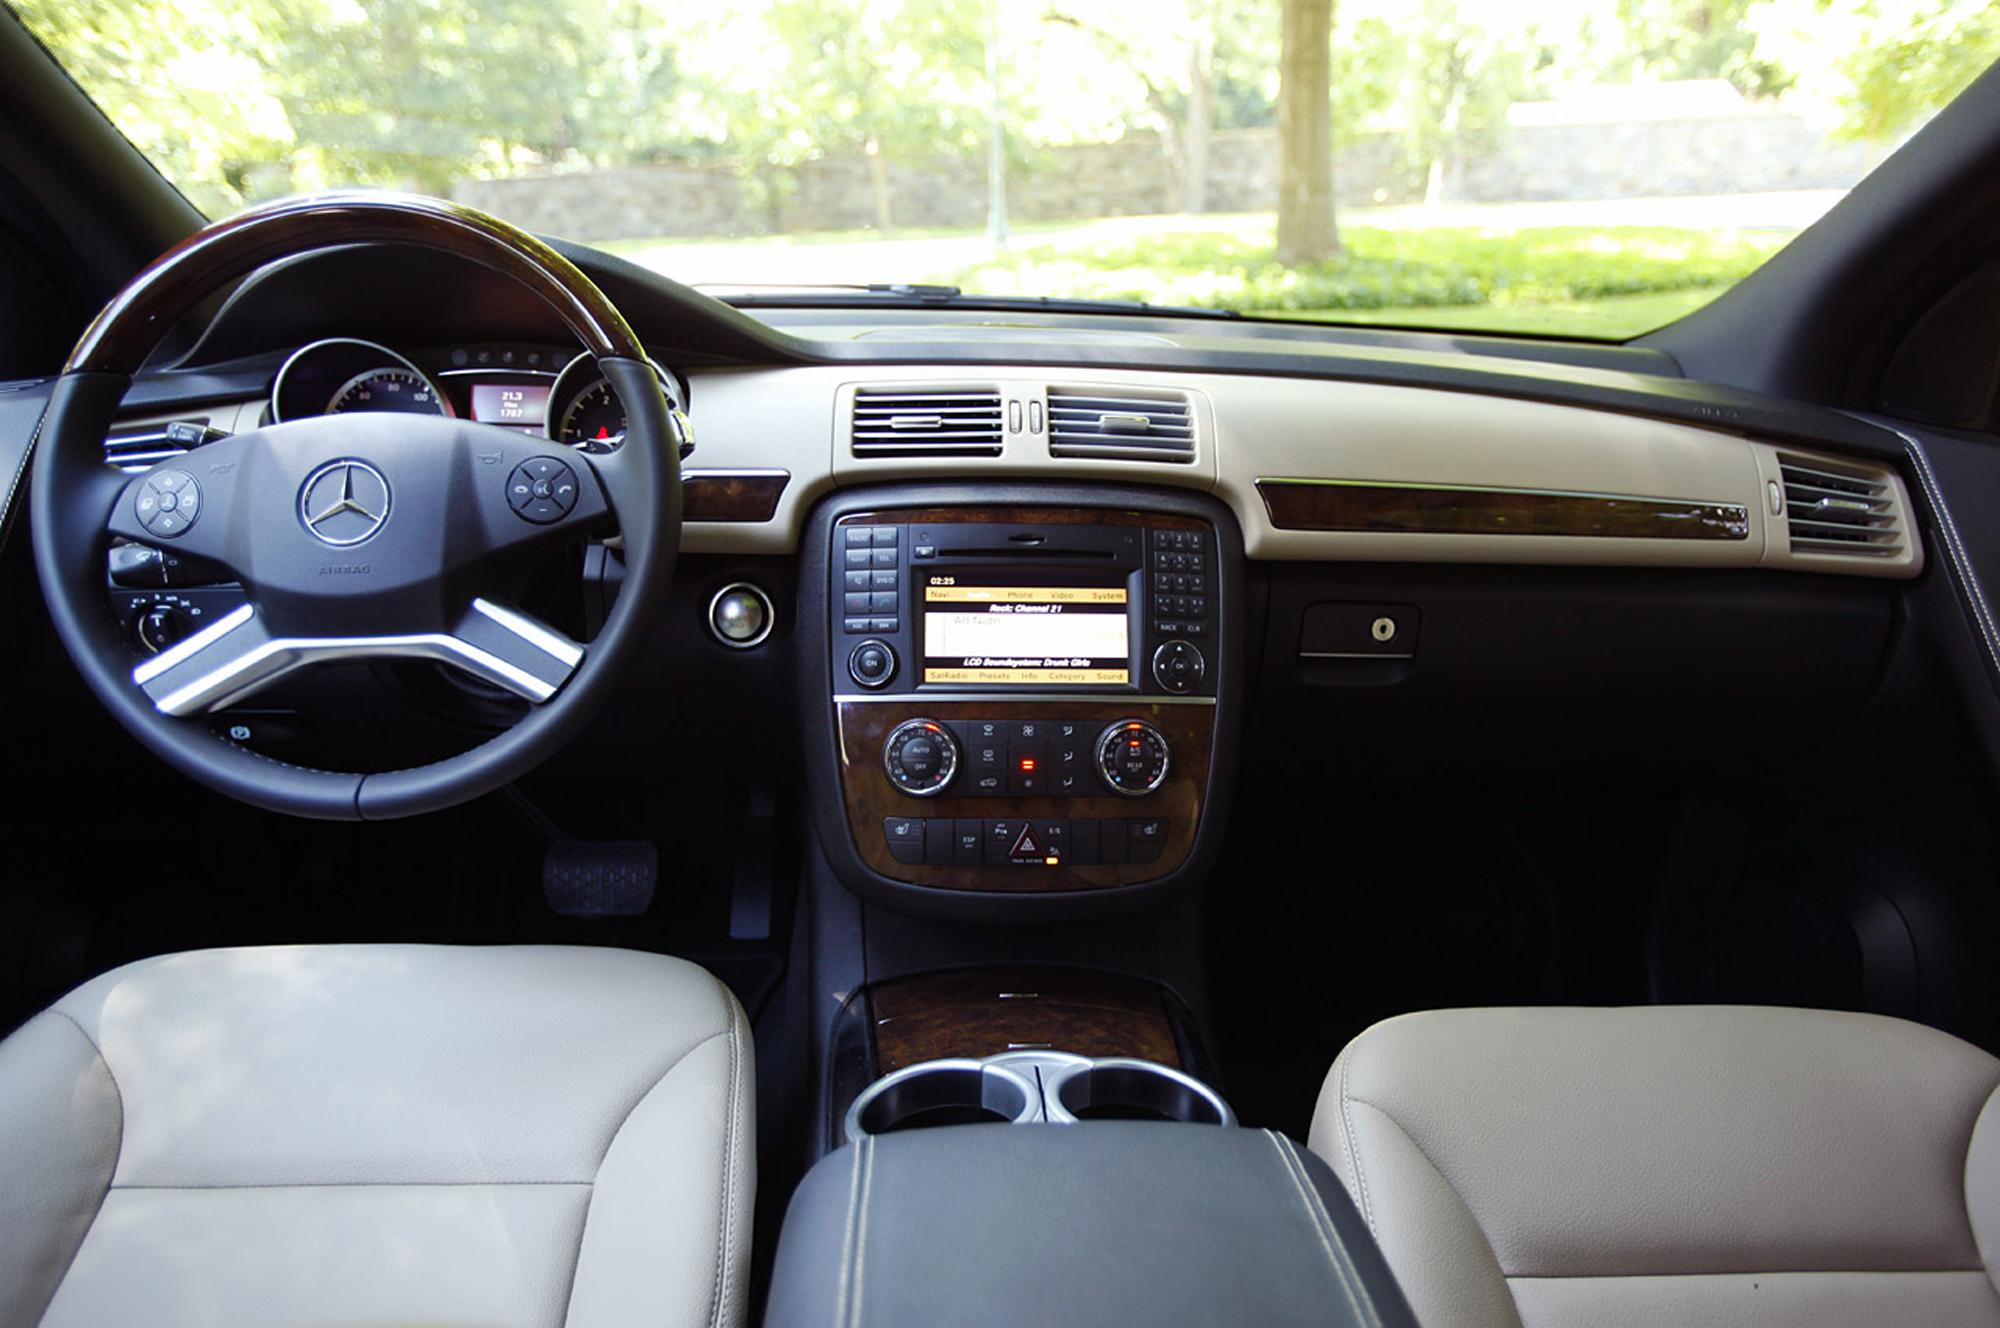 Pics for mercedes r class 2014 interior for Mercedes benz r class 2014